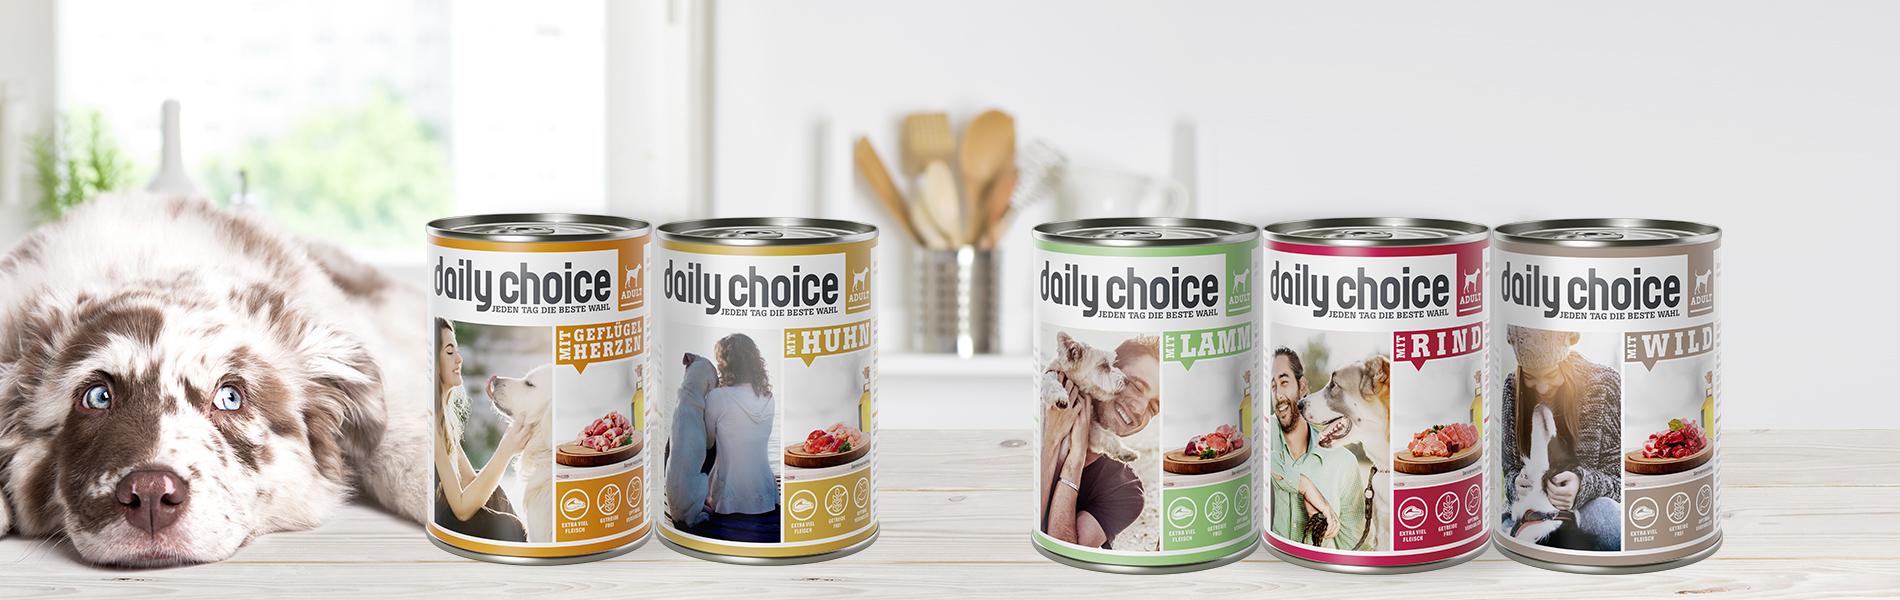 daily choice Hund Nassfutter Fleischmenü Getreidefrei